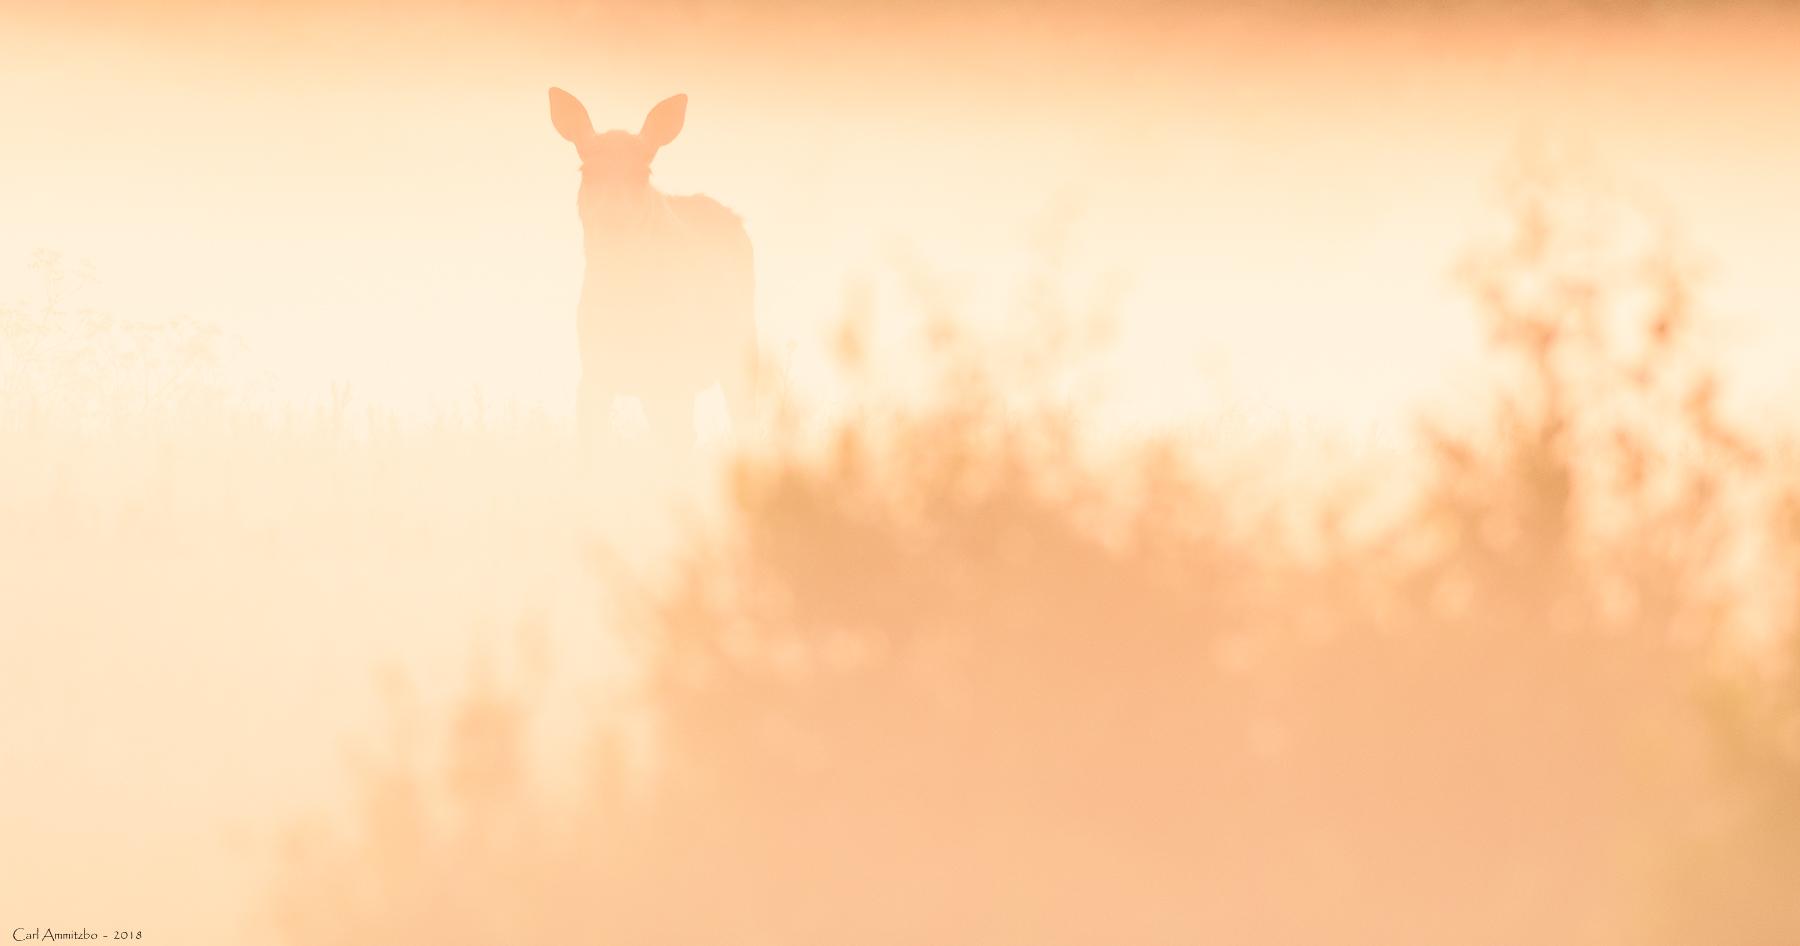 03 - 0609 - Elg i dis - 03a - Bergslagen